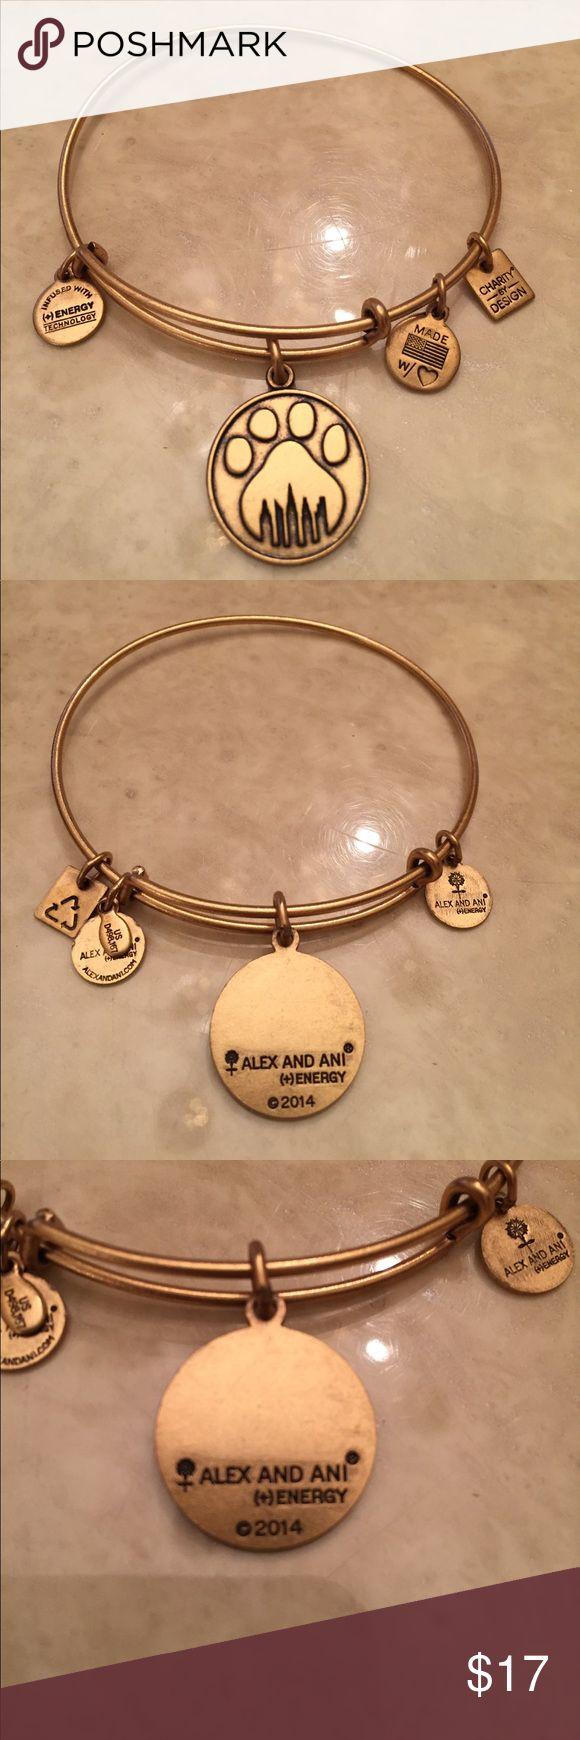 ALEX & ANI PAW PRINT BRACELET Alex & Ani paw print bracelet in gold..worn only a few times..in excellent condition..refer to pics.. Alex & Ani Jewelry Bracelets